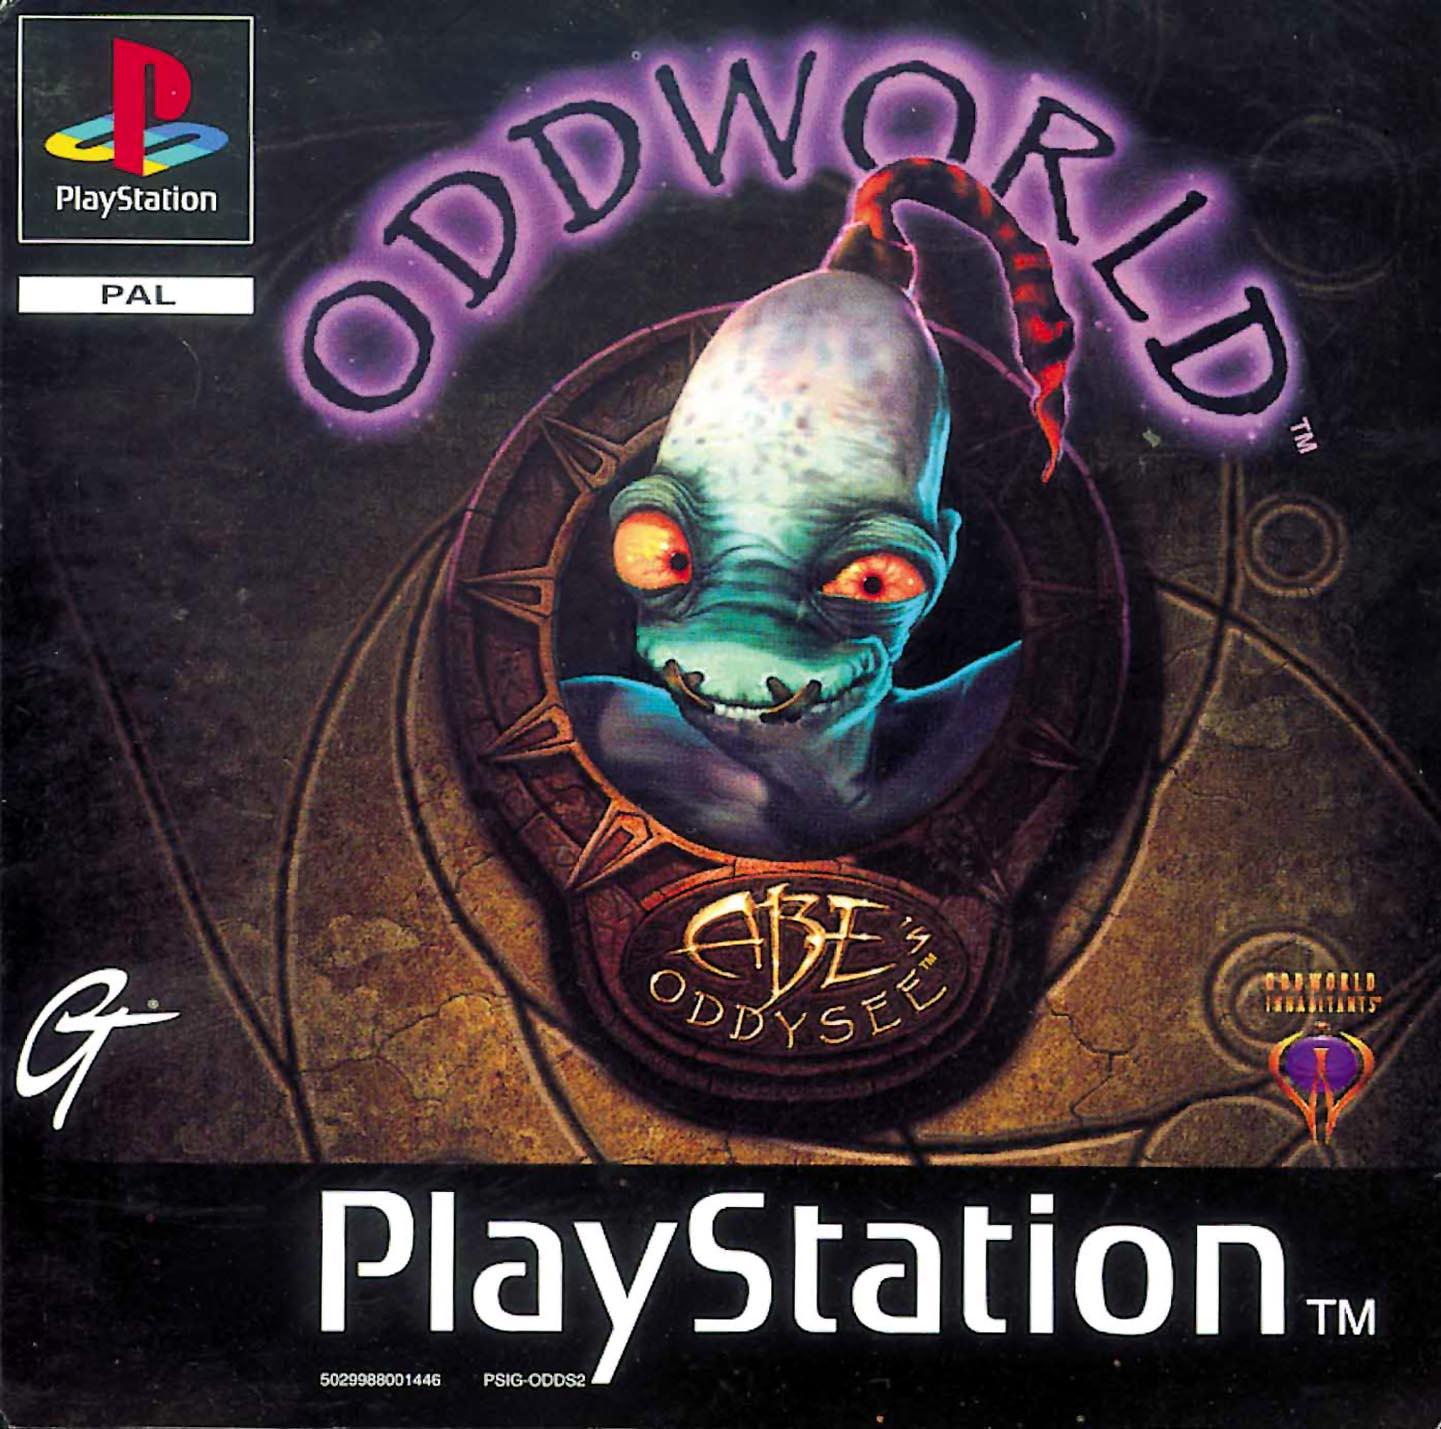 Oddworld - Abe's Oddysee (okładka)